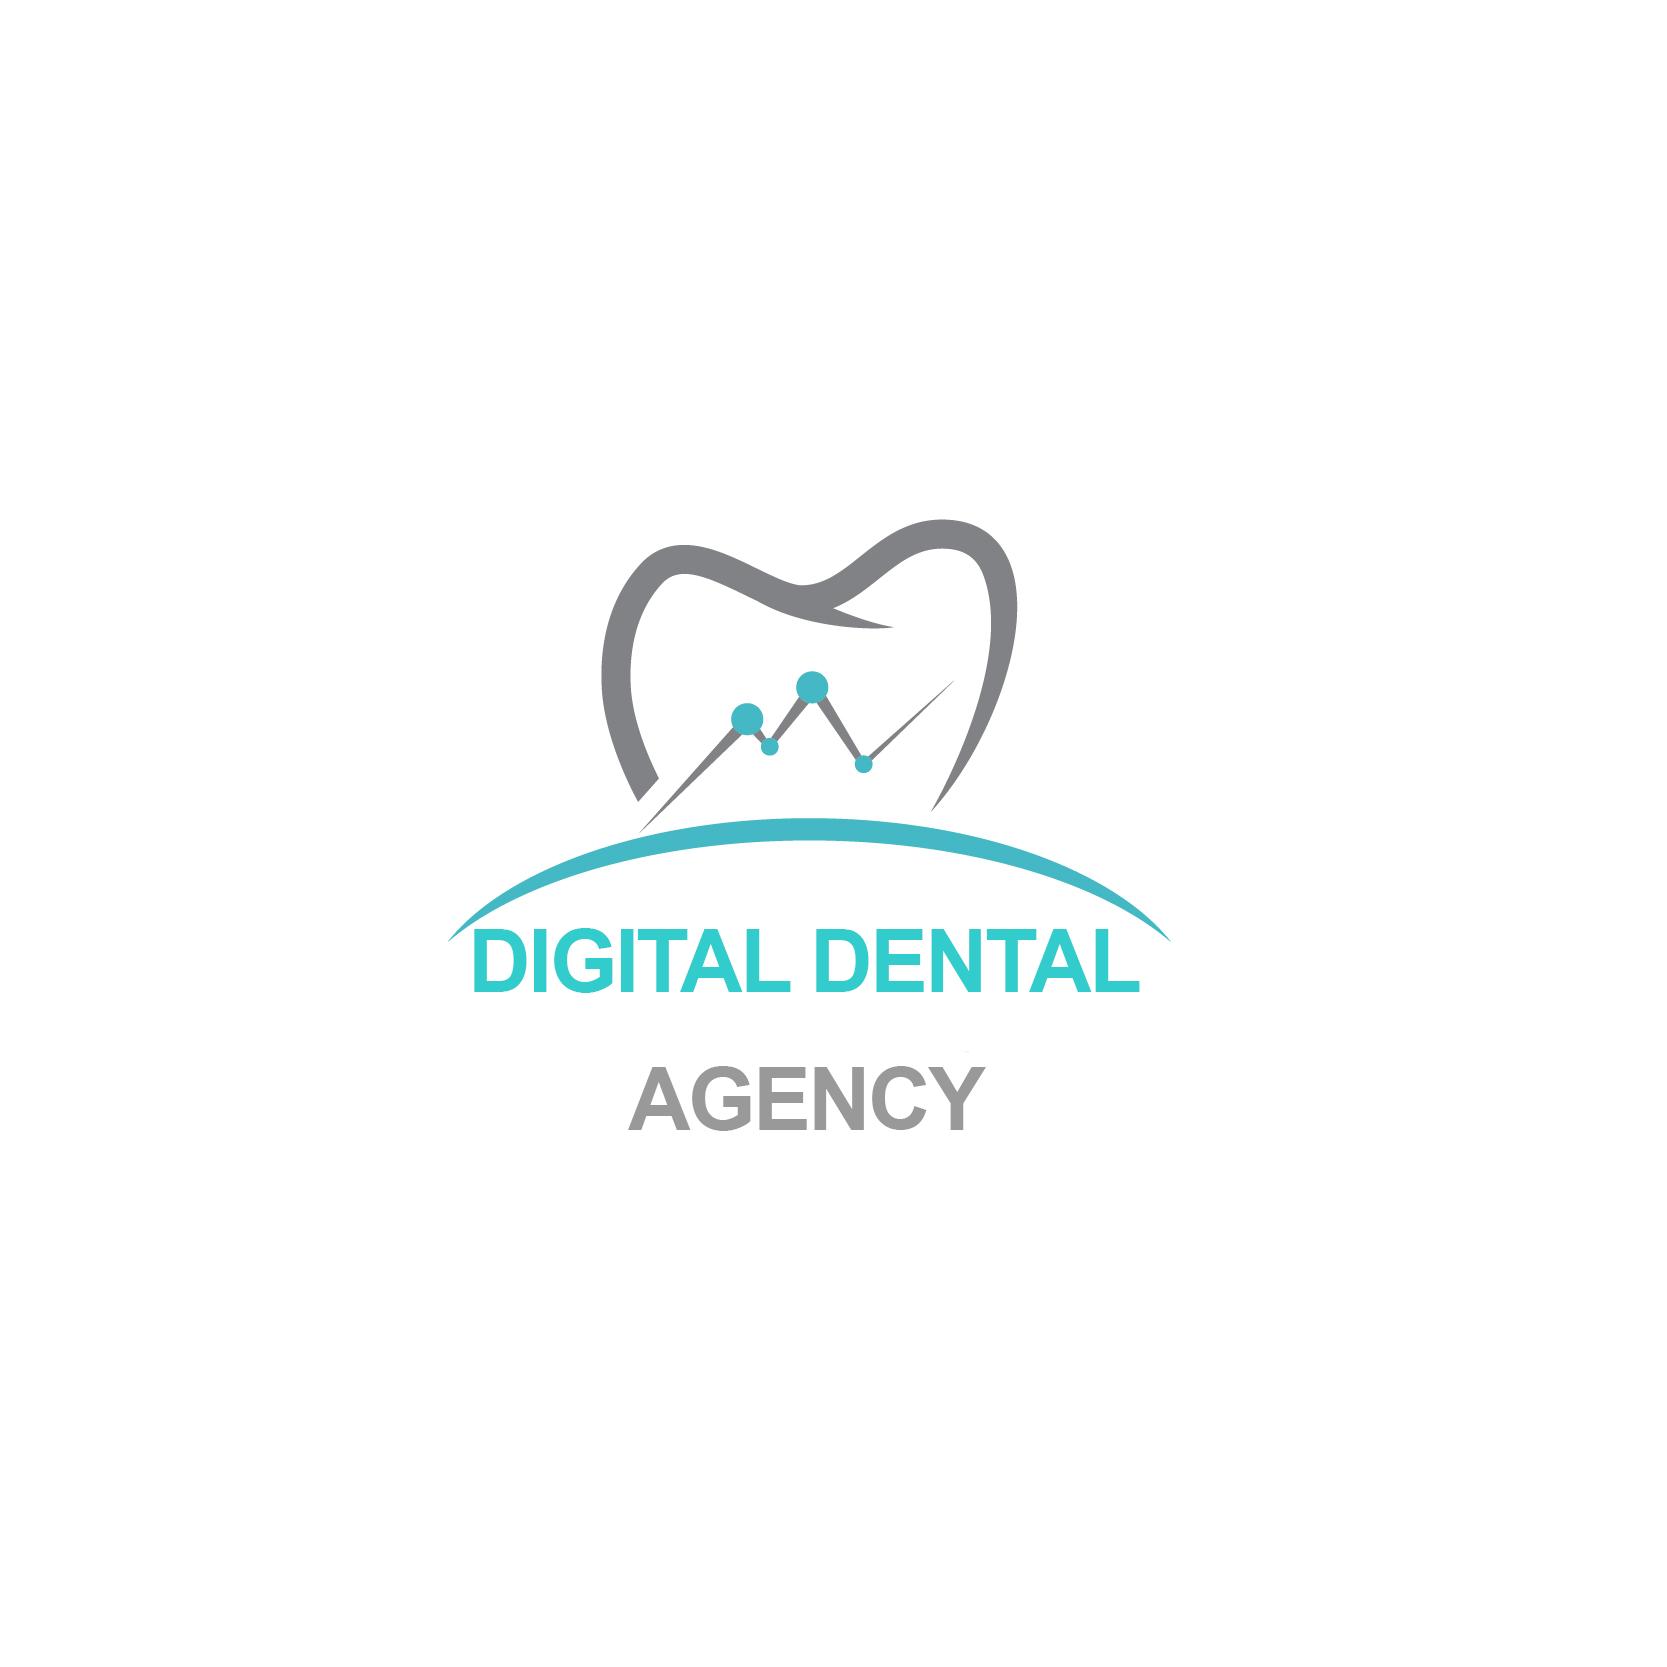 Logo Design by Serhat Doymuş - Entry No. 91 in the Logo Design Contest Imaginative Logo Design for Digital Dental Agency.